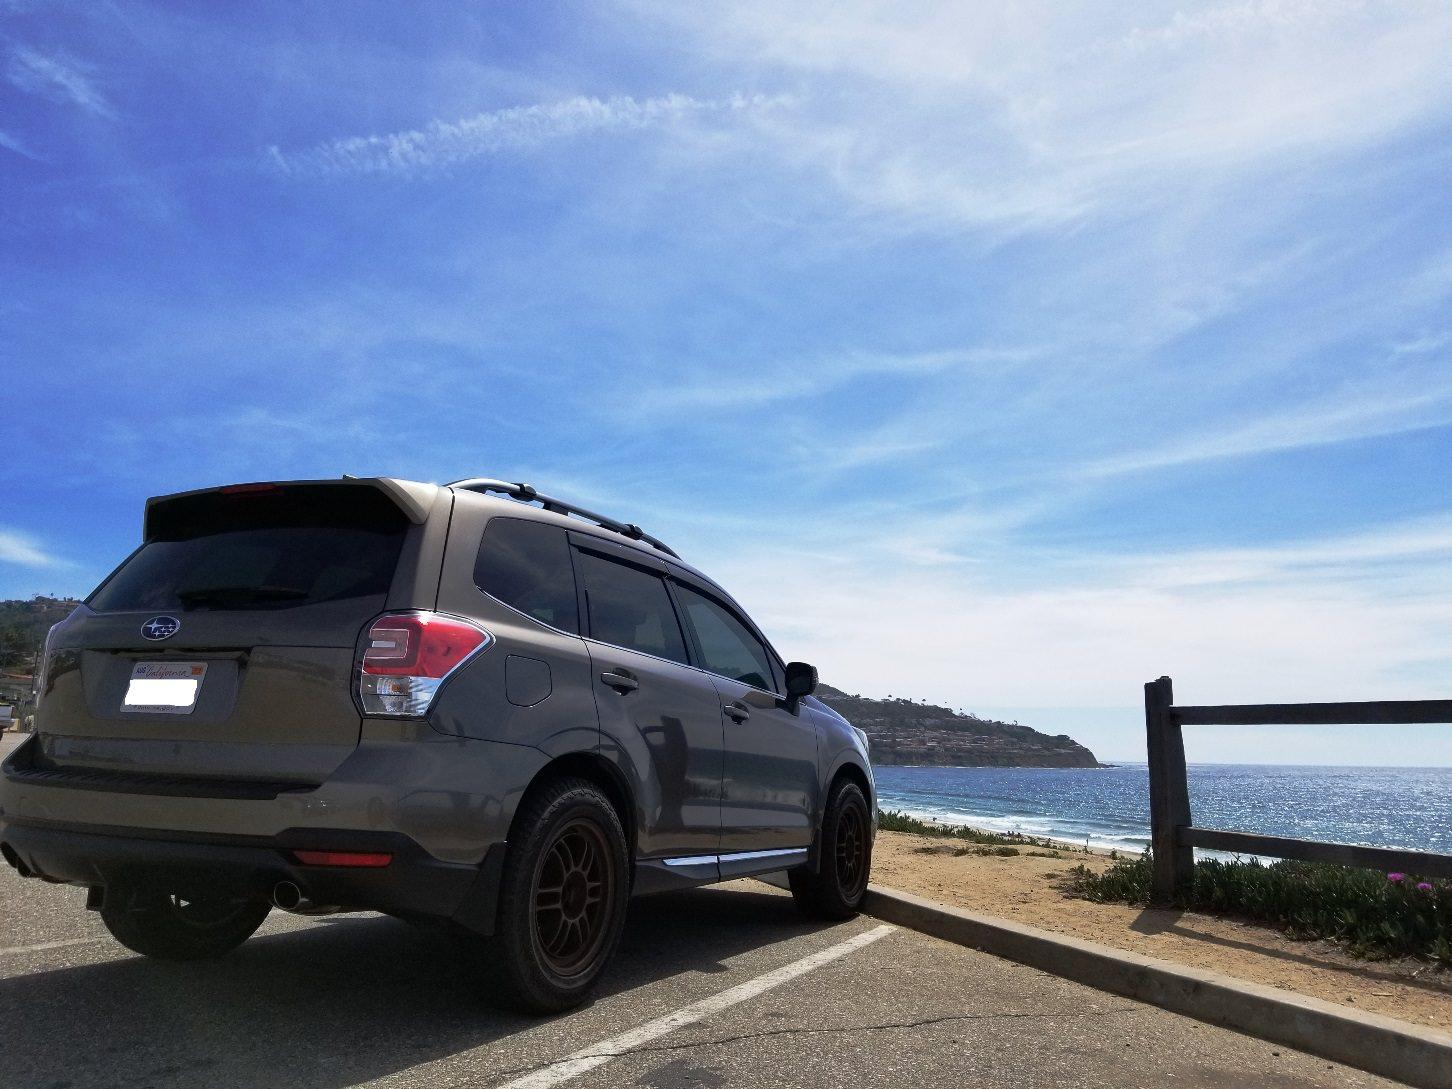 14-'18) - Waldo's 2017 F-XT Touring | Subaru Forester Owners Forum